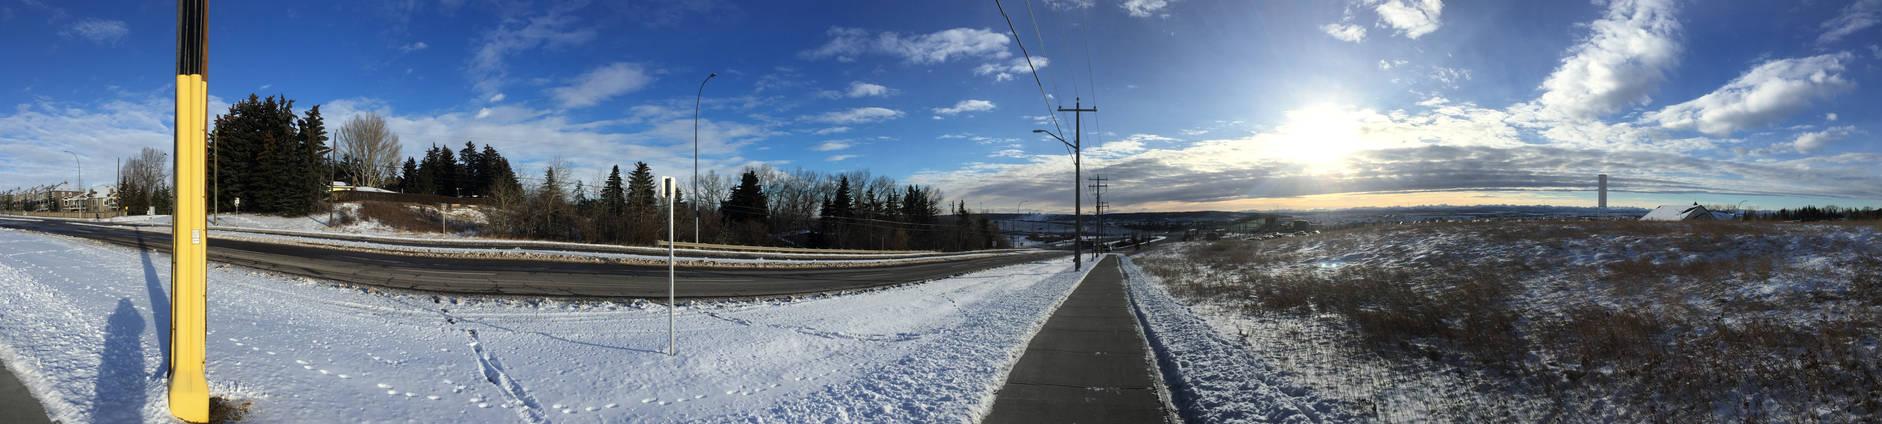 Calgary - Tuscany Station Panorama